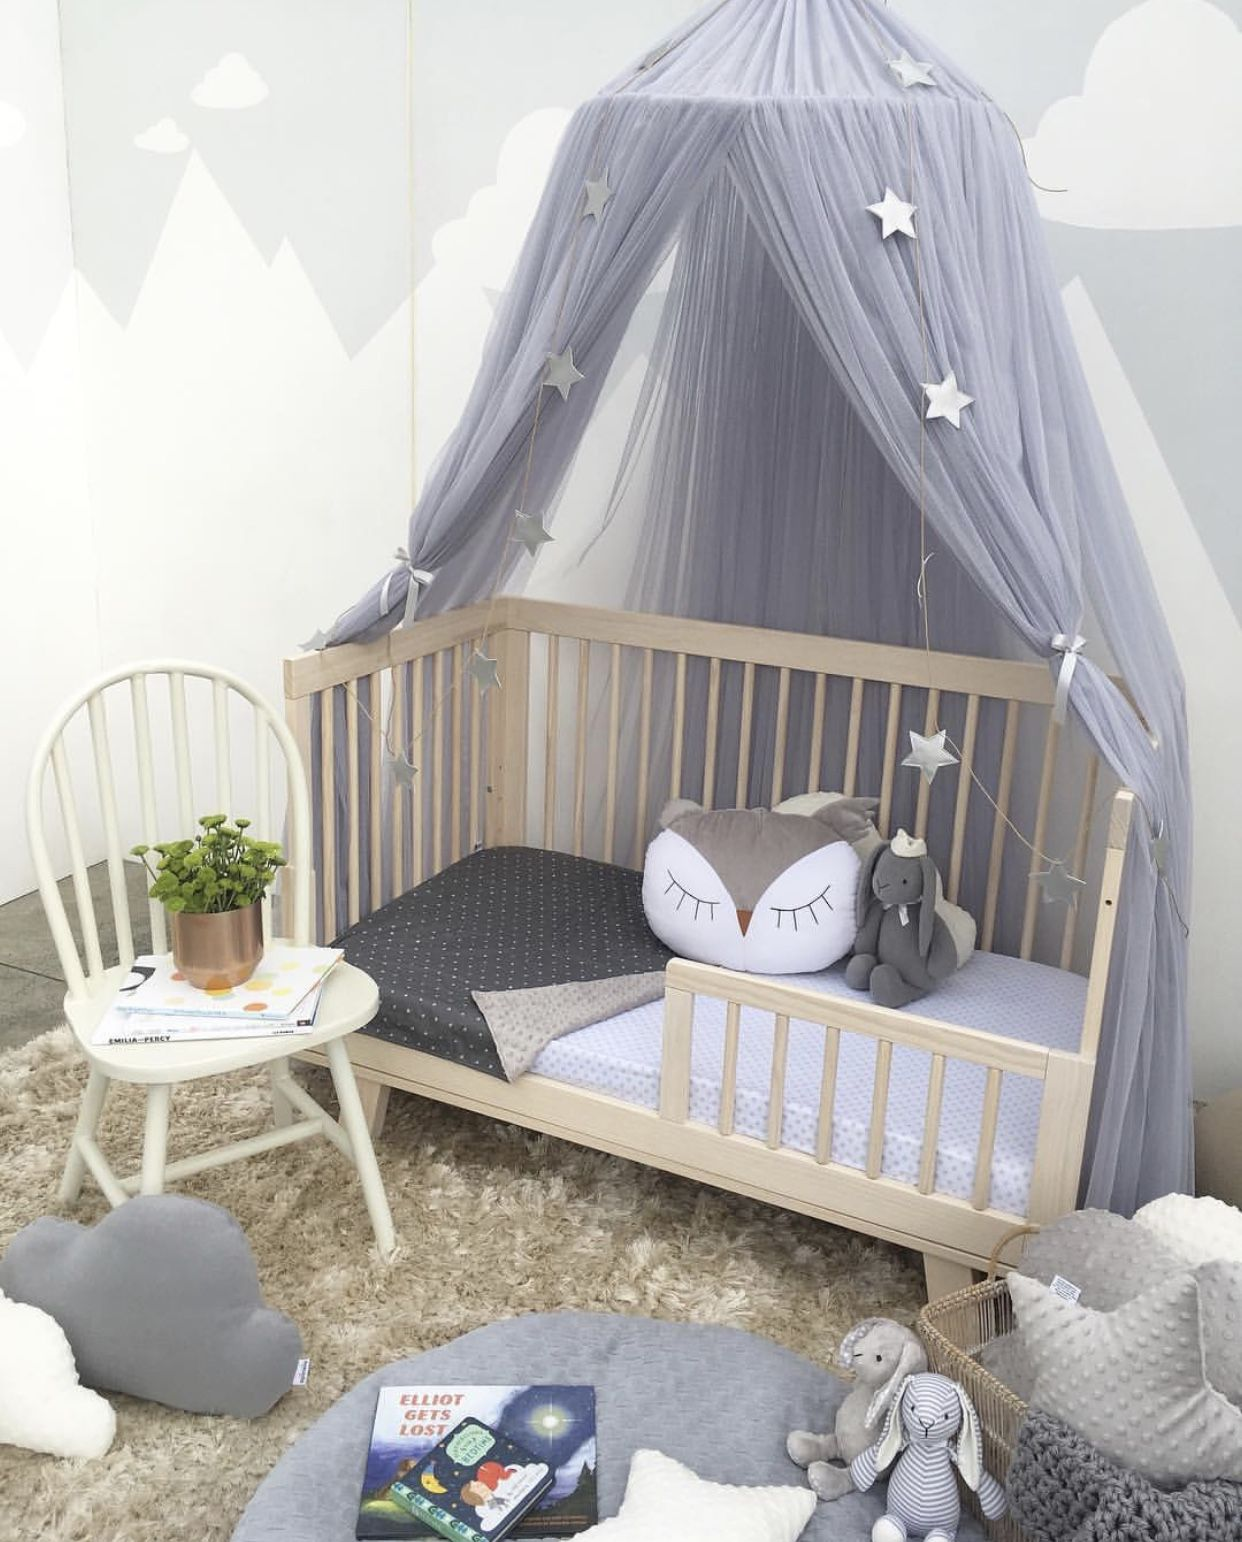 Nursery inspo with Spinkie dreamy canopy in light grey